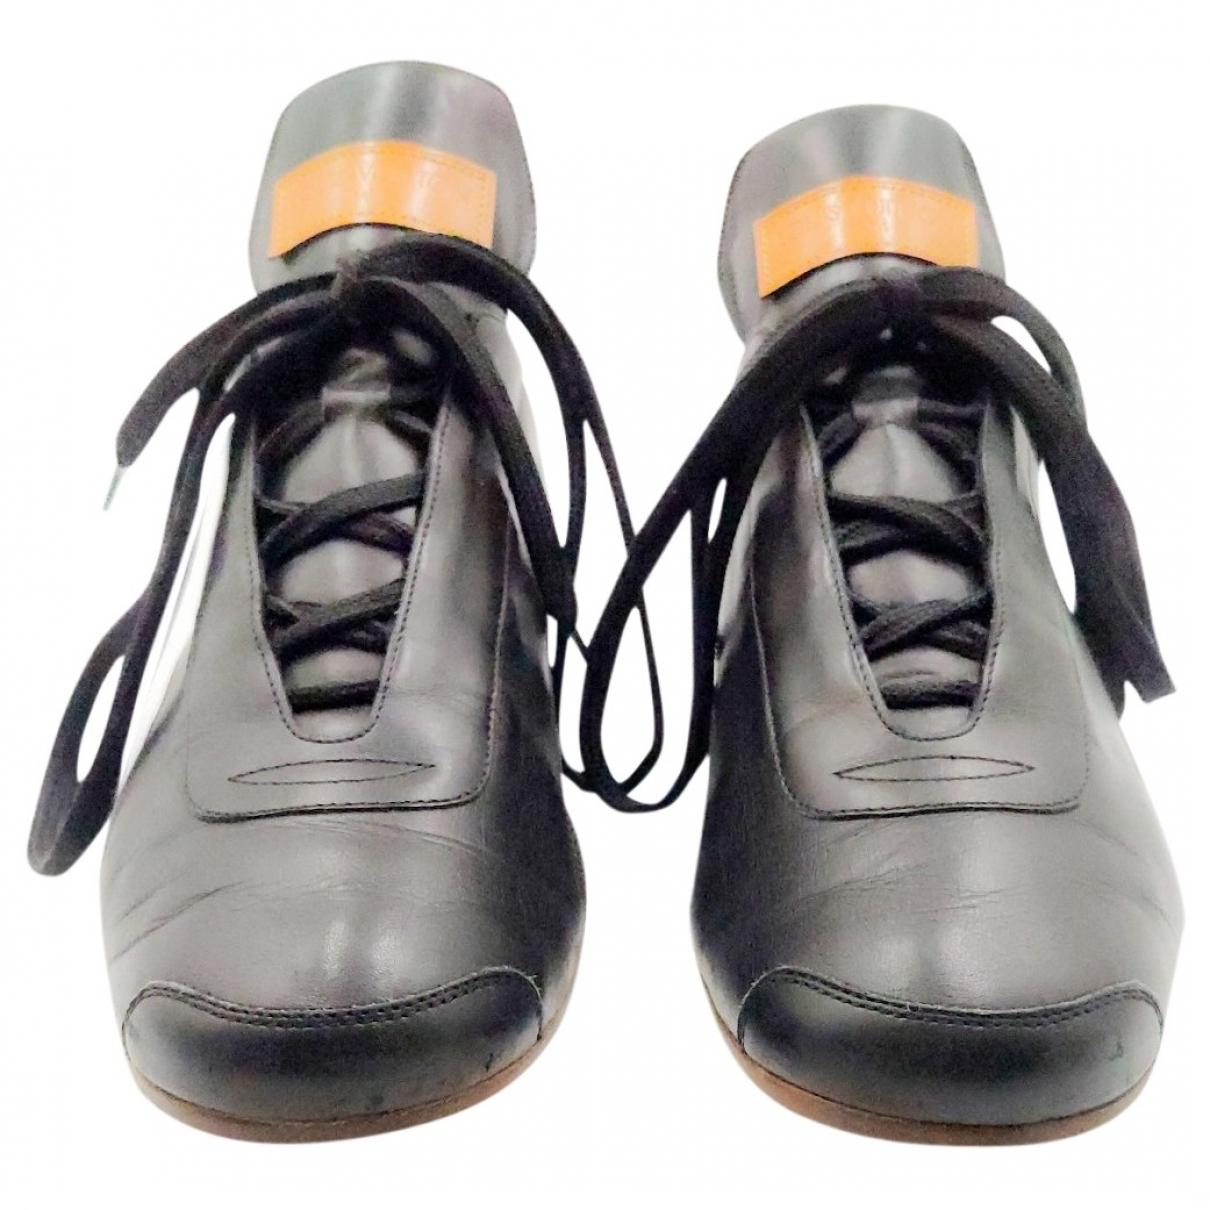 Louis Vuitton LV Trainer Black Leather Trainers for Men 7.5 UK